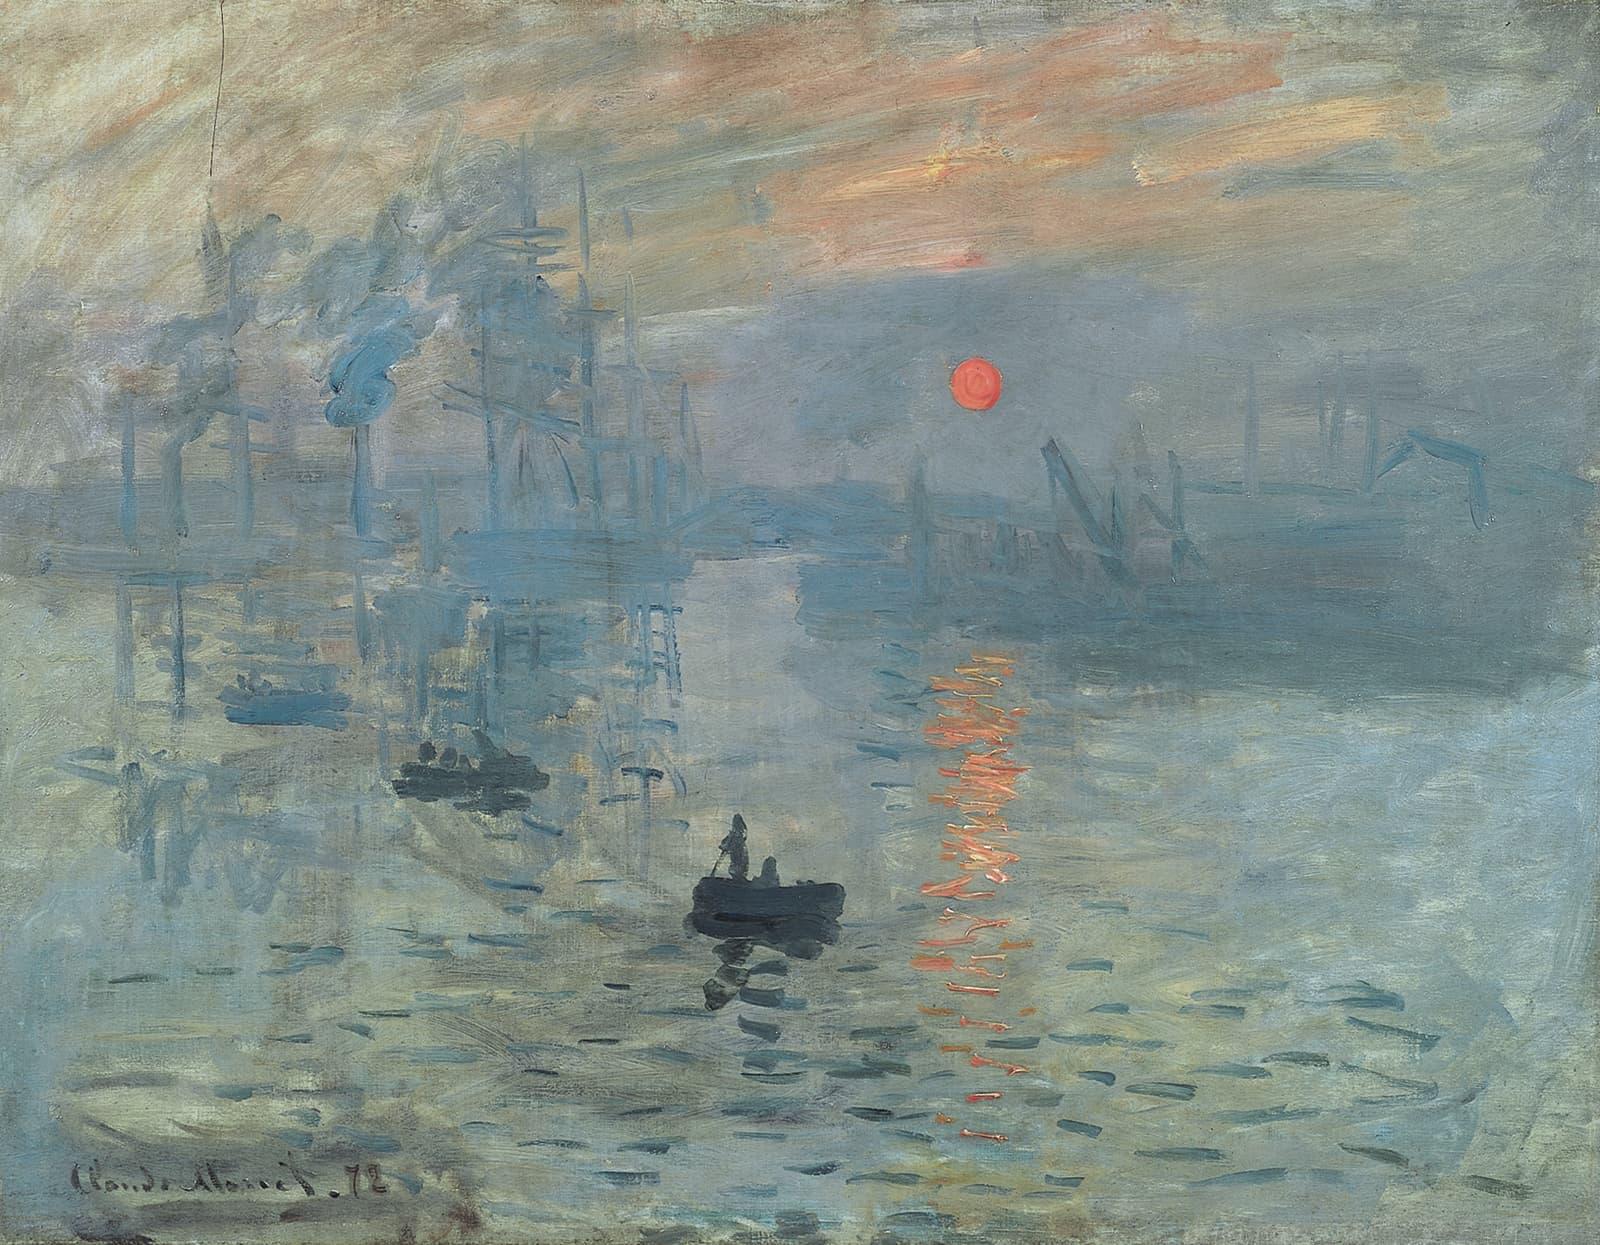 """Impresión, sol naciente"" (1872) por Claude Monet"